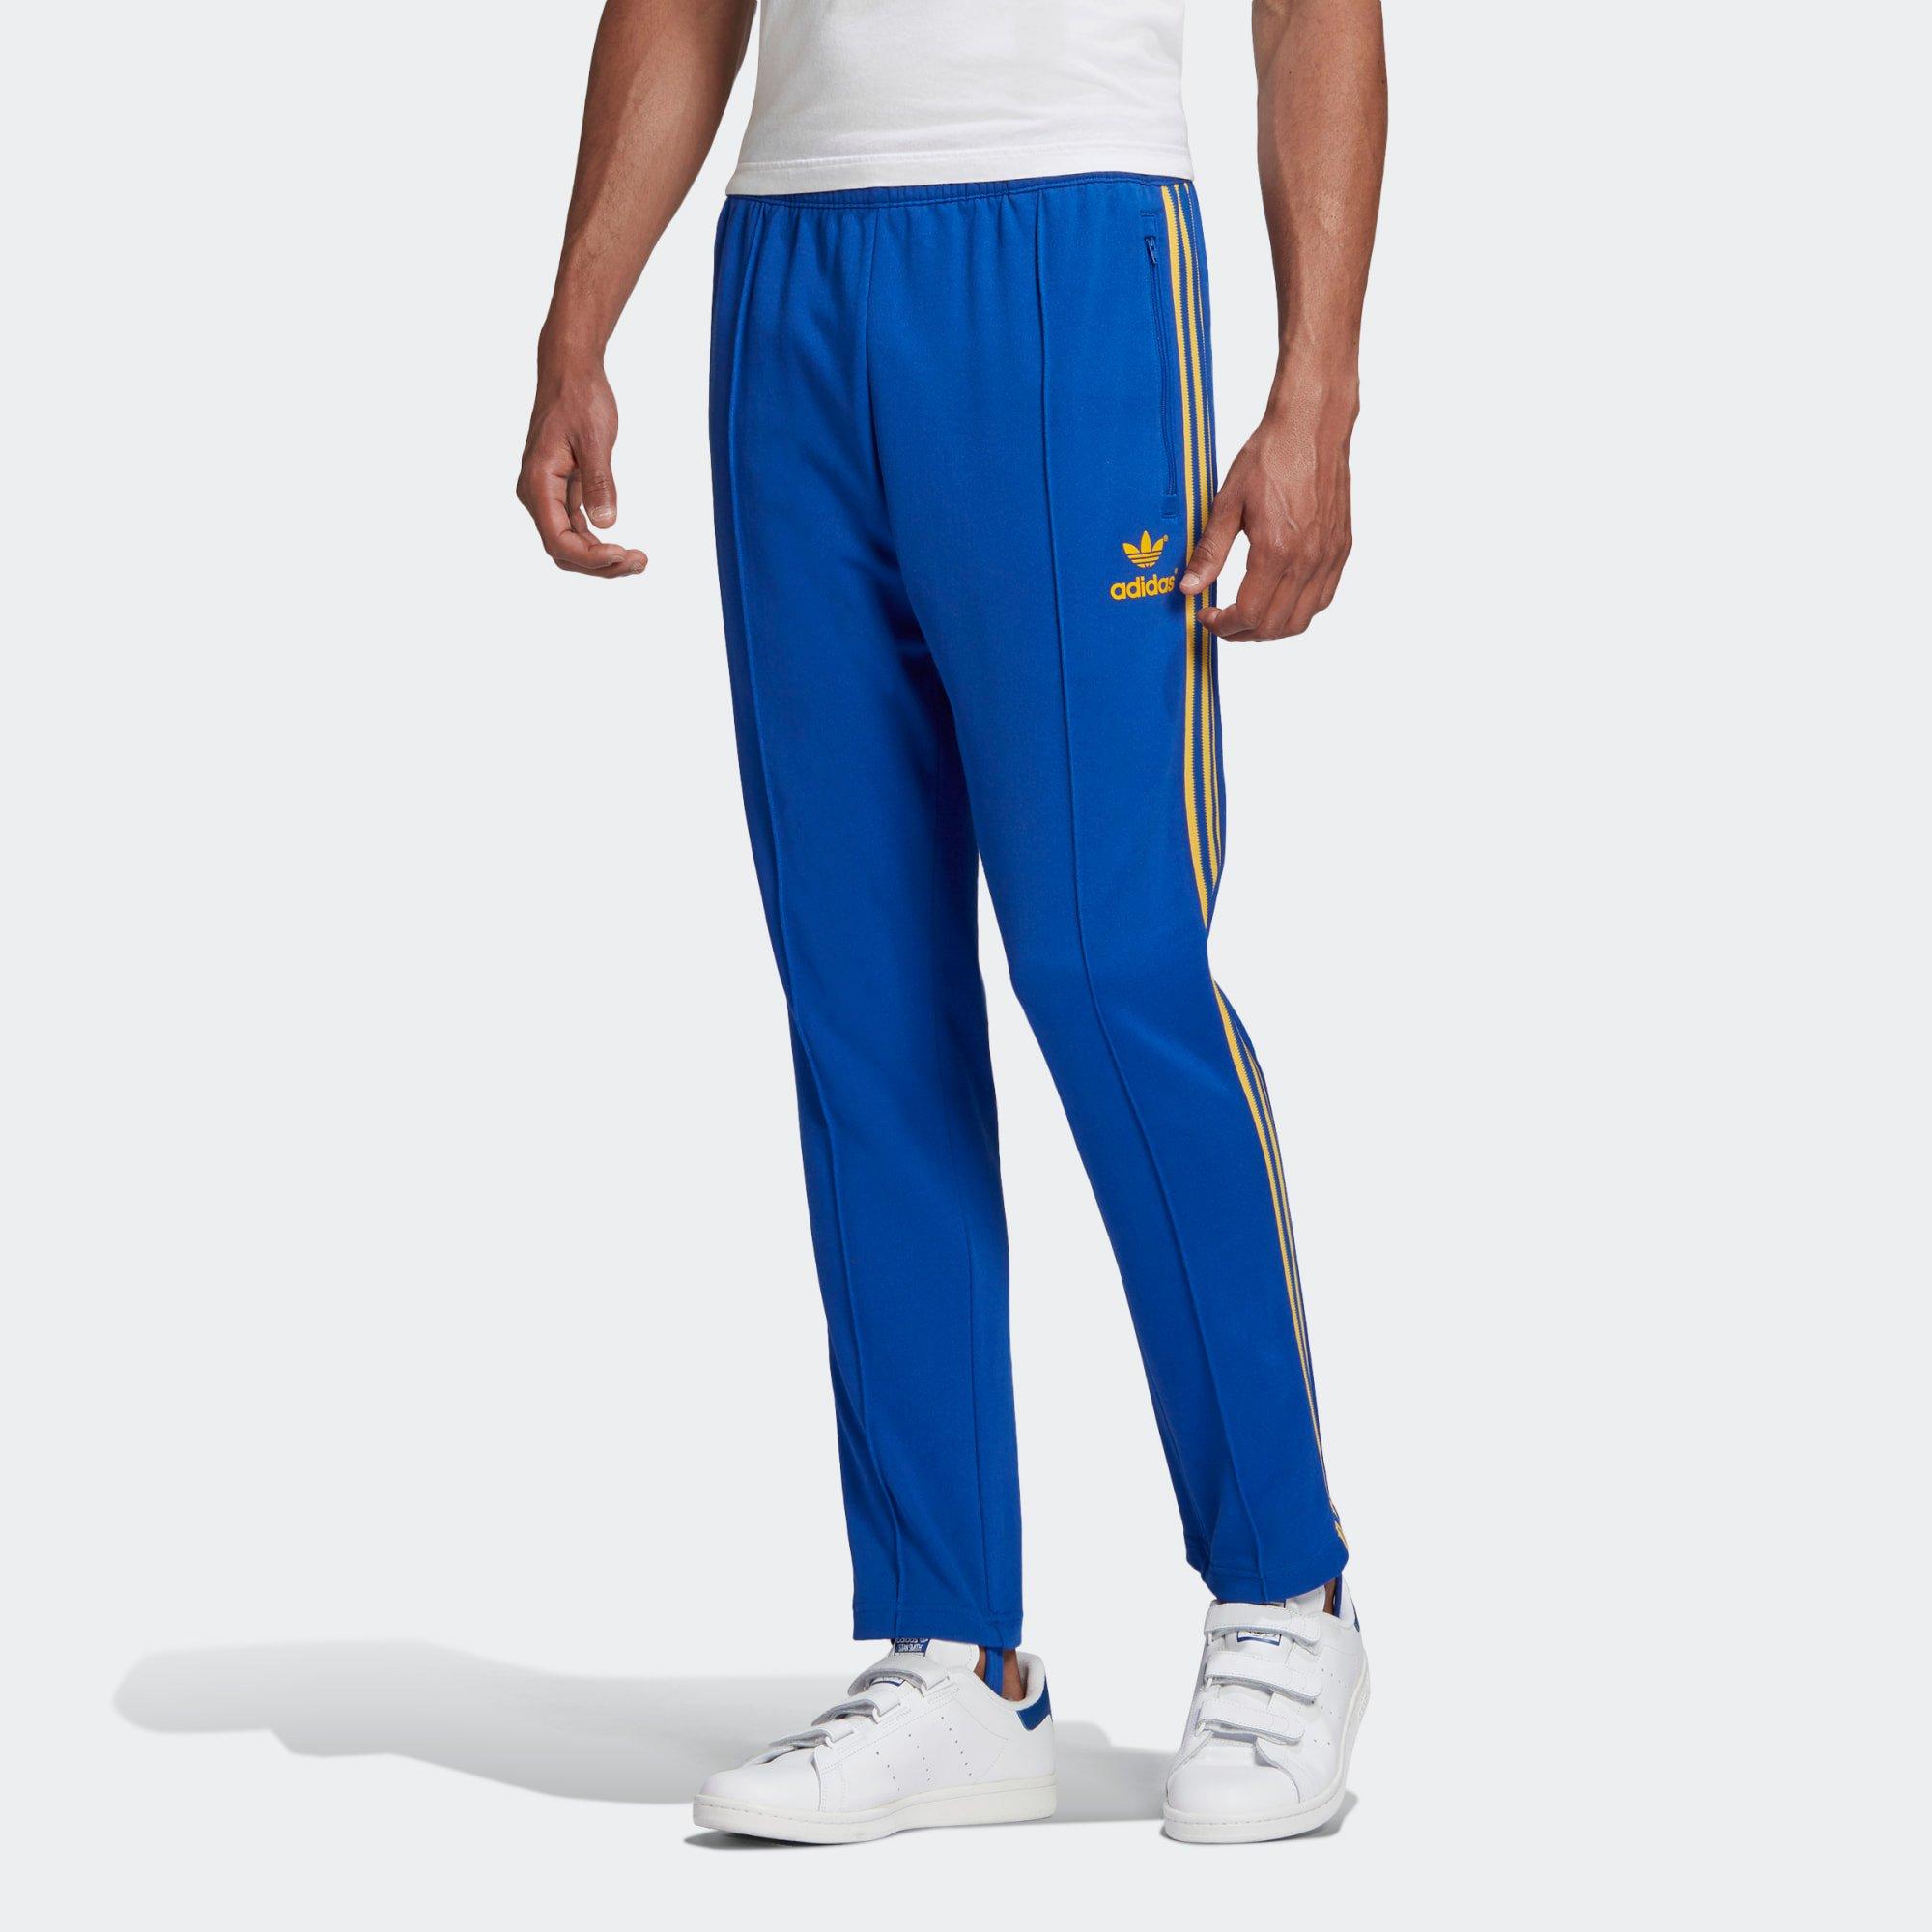 Track_Pants_1_-_Adidas